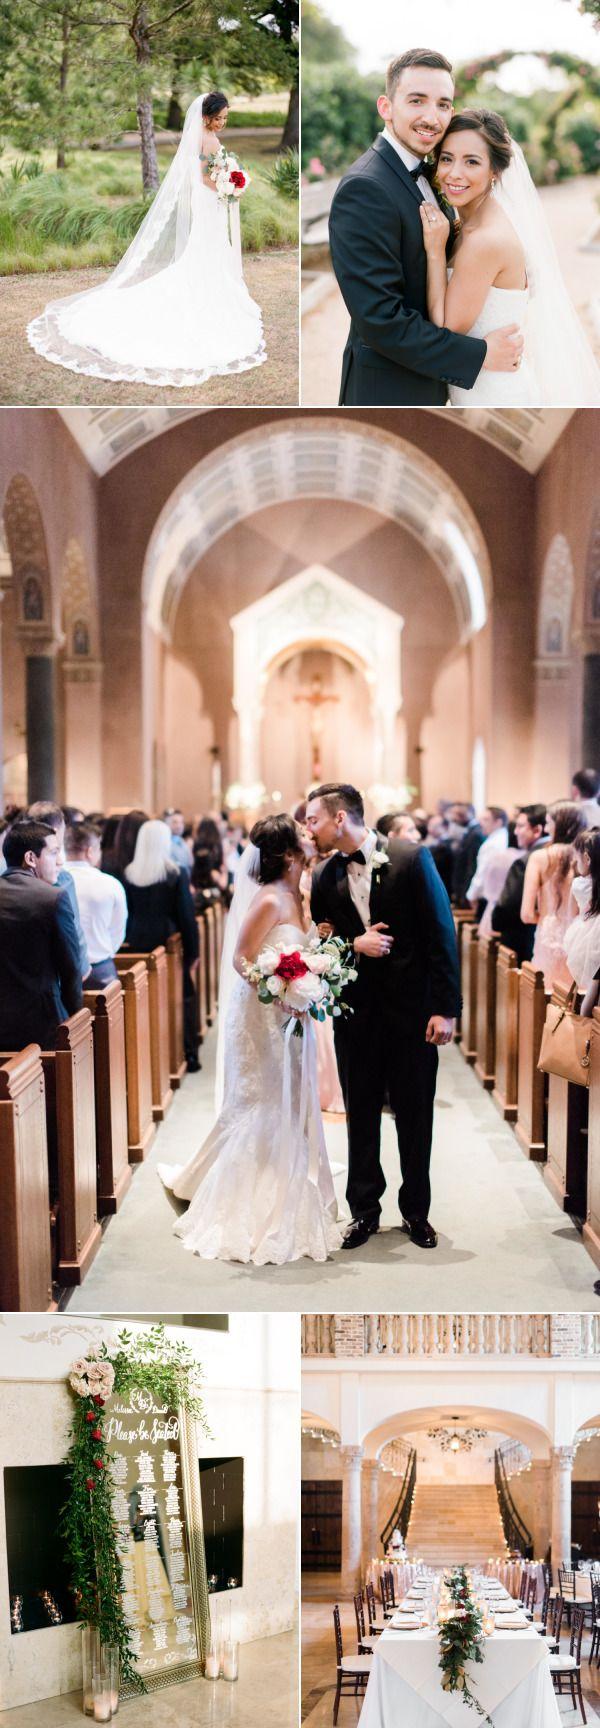 136 best Wedding Aisle images on Pinterest | Wedding aisles ...